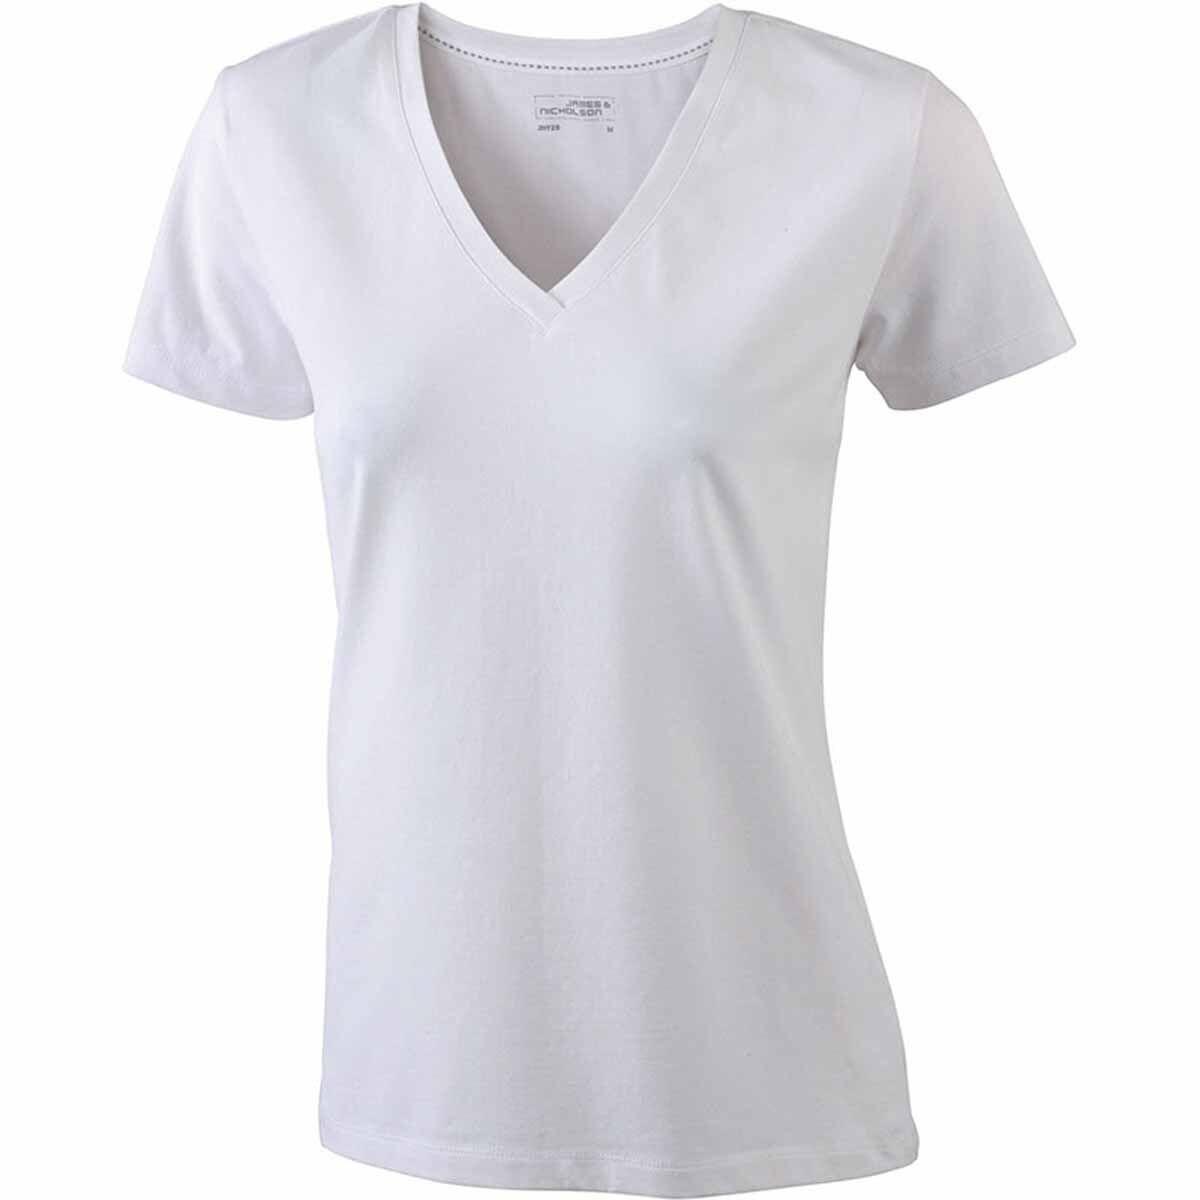 bffcfce6b137f T-Shirt Col V - Extensible - Jn928 - Blanc - Femme - Manches Courtes .